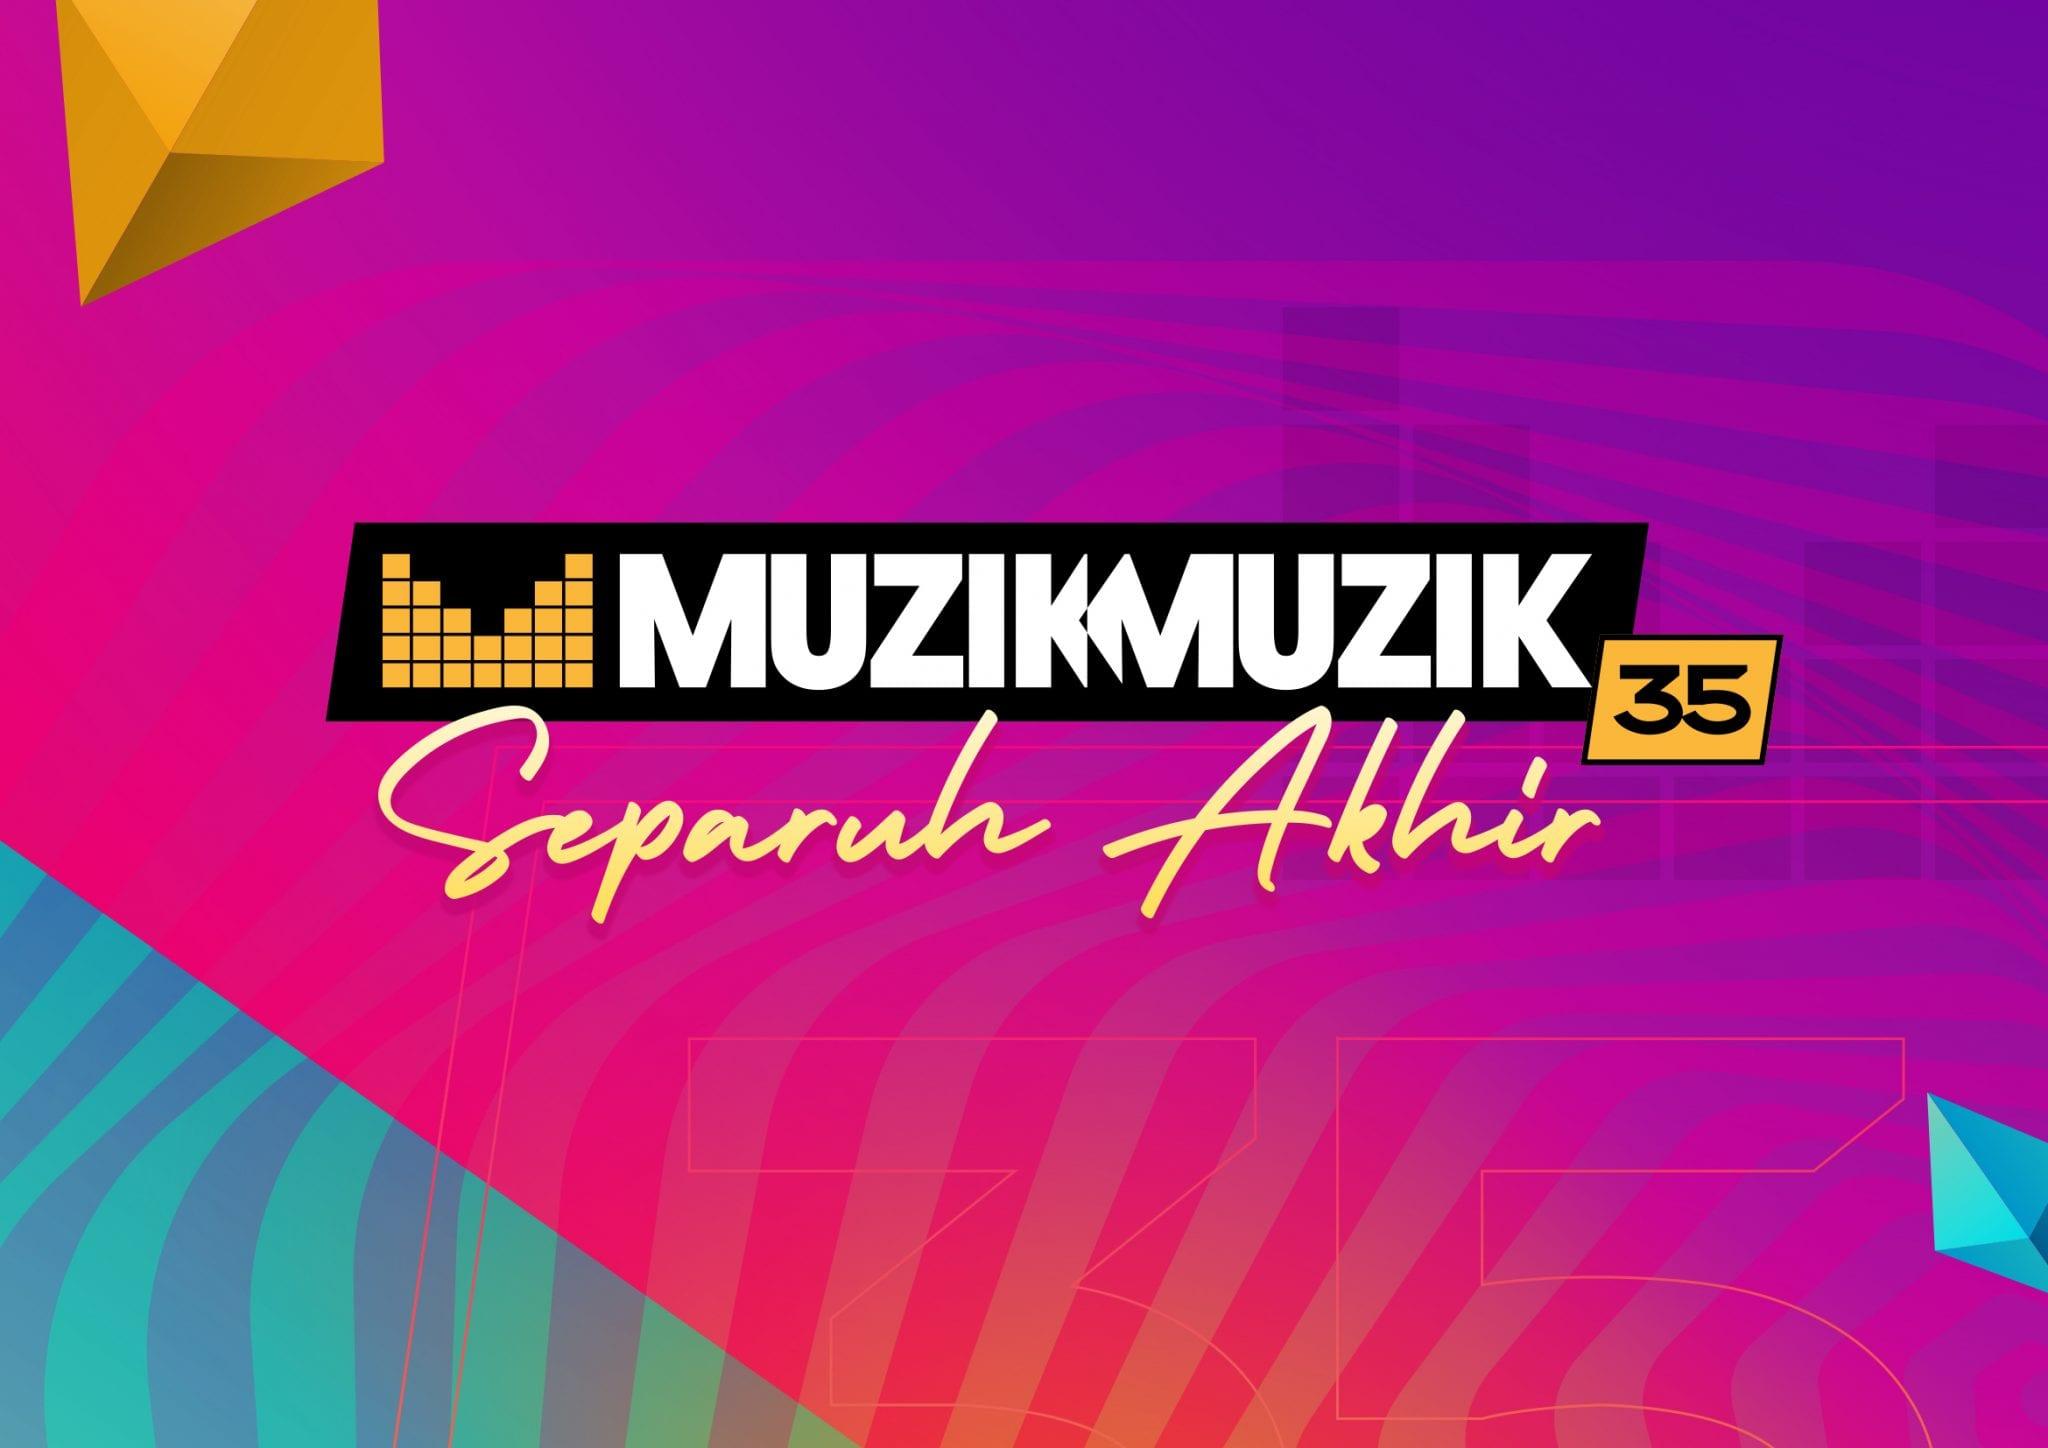 """Ini Pertandingan Untuk Lagu"" - Azmeer Dedah AJL Bukan Pertandingan Nyanyian 5"